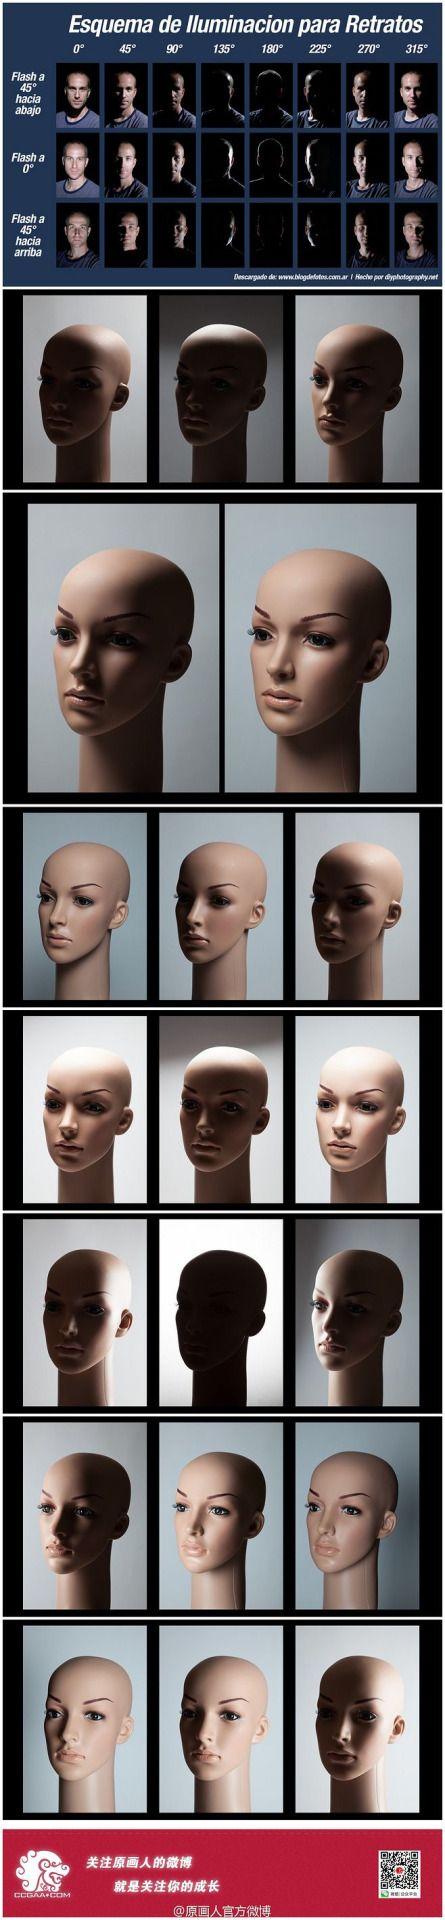 anatoref: Top ImageRow 2Row 3Row 4Row 5Row 6, 7, & Bottom Image